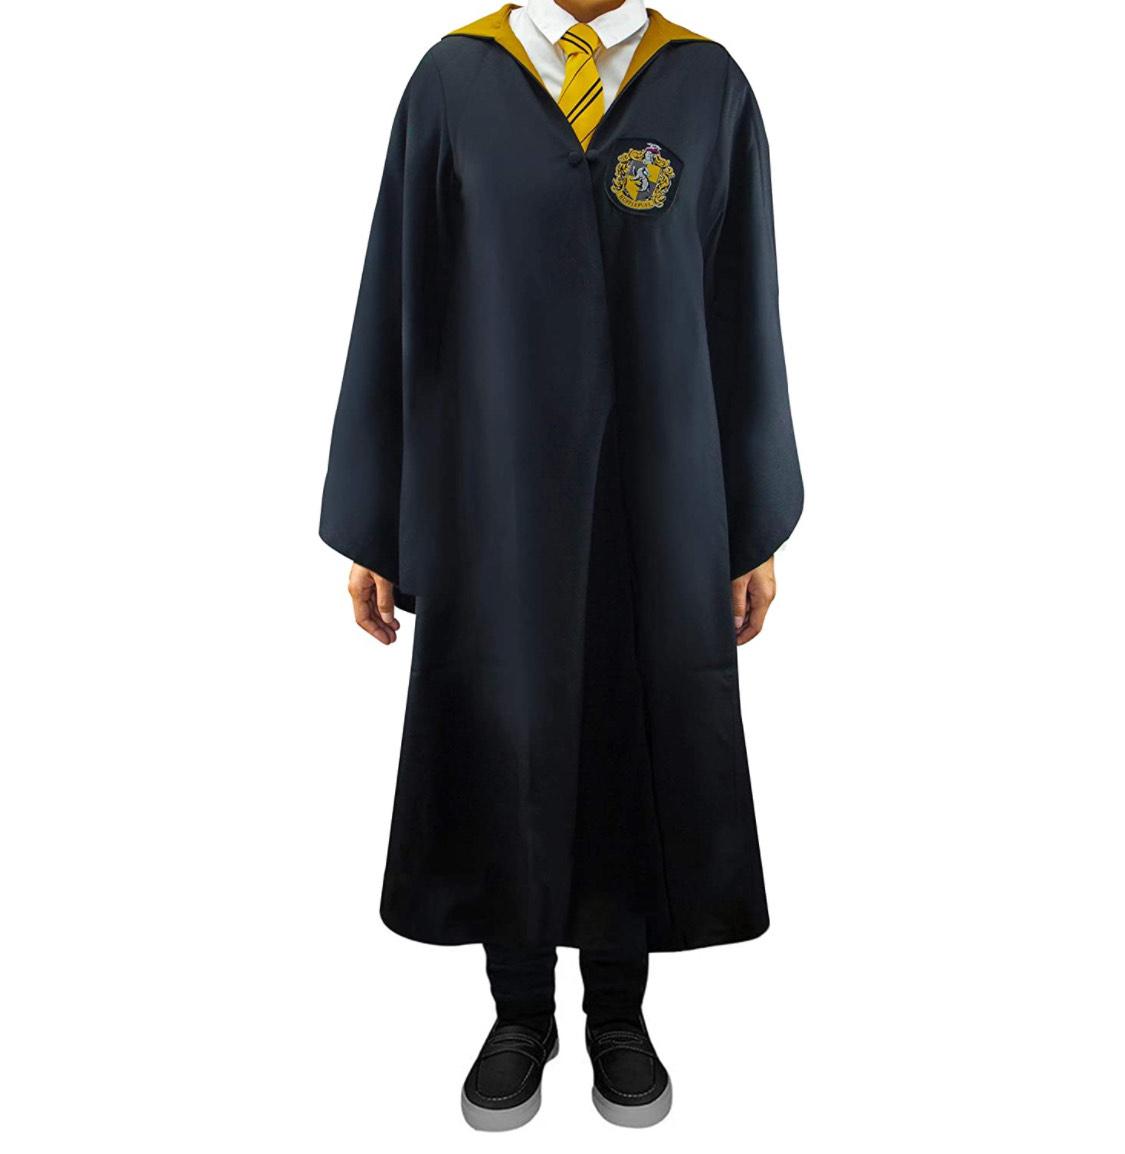 Capa oficial Harry Potter Hufflepuff talla M adulto (excelente calidad)